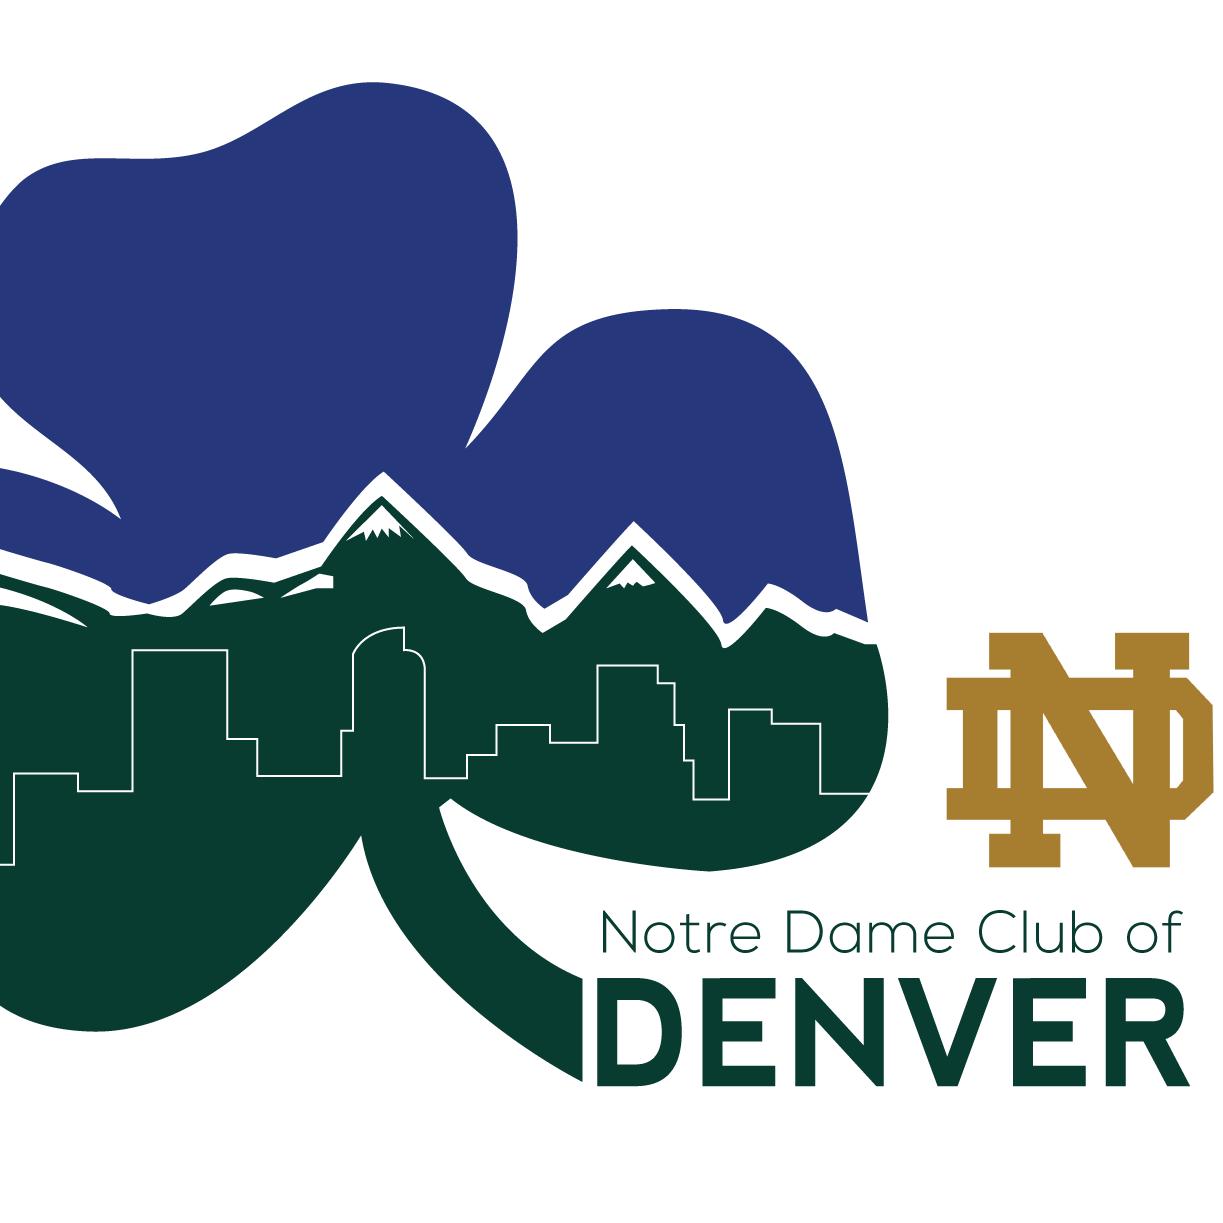 Notre Dame Club of Denver - Butterfly Garden